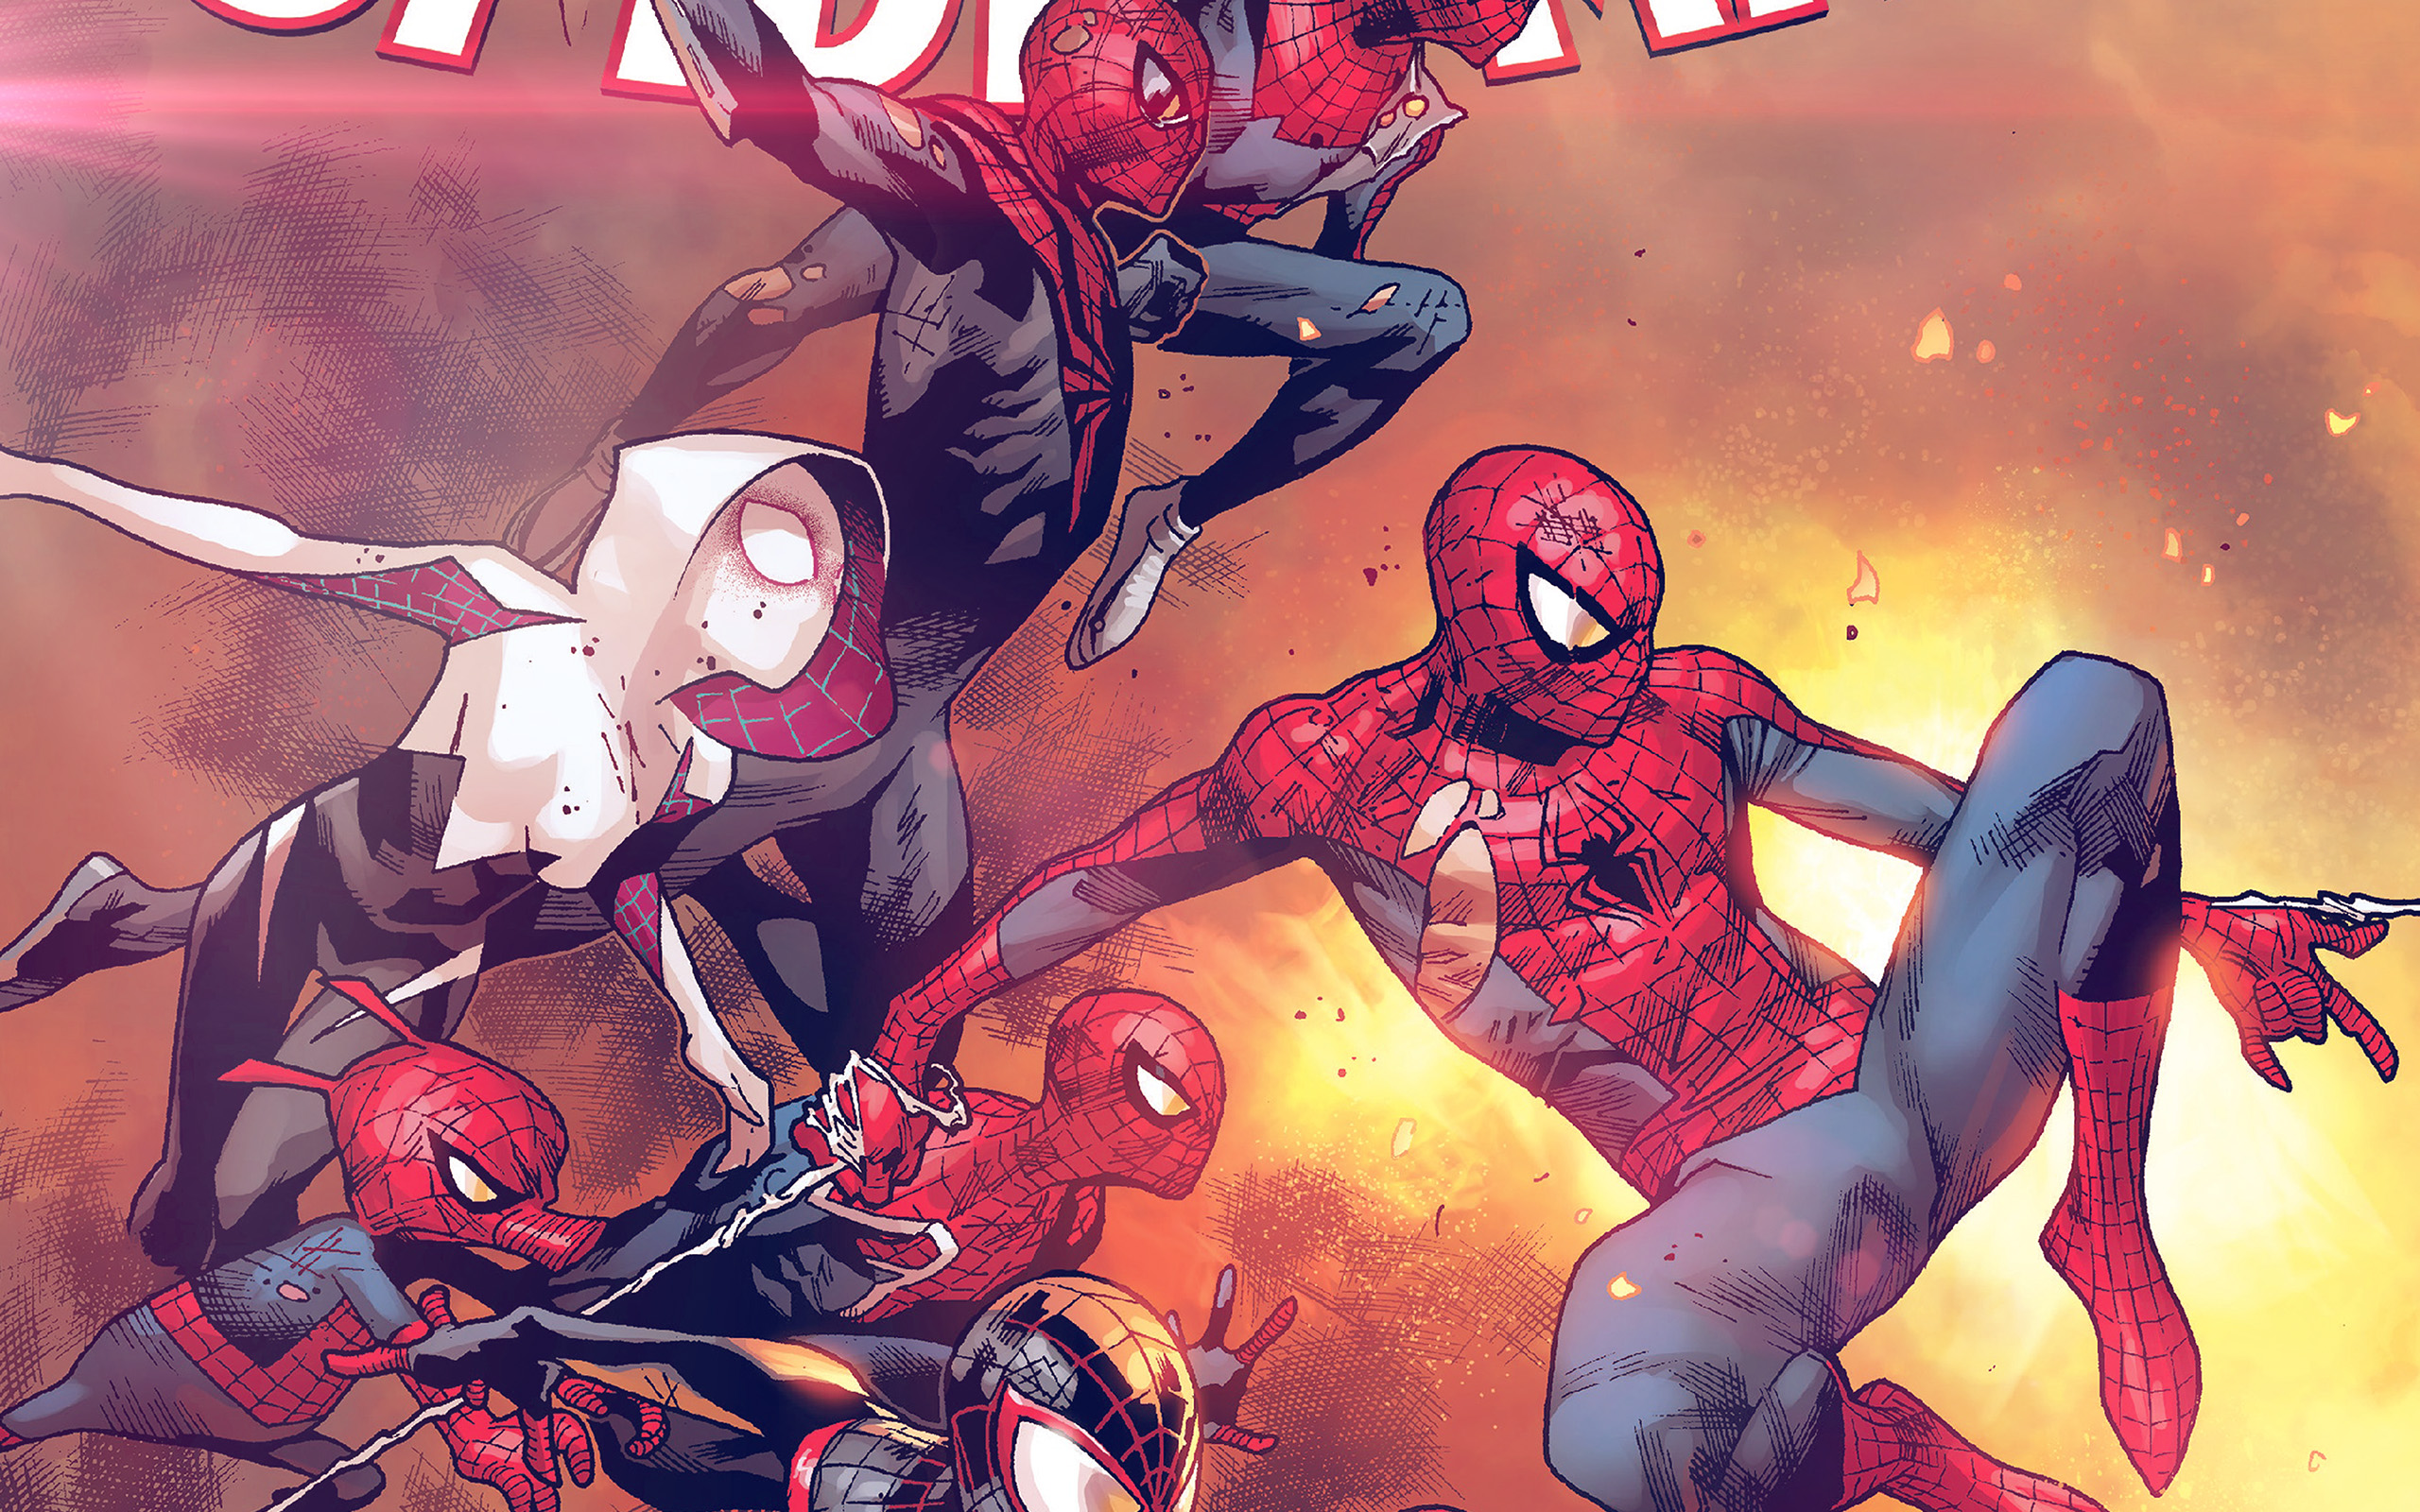 Large Hd Wallpapers For Laptop Al98 Amazing Spiderman Marvel Art Hero Film Anime Flare